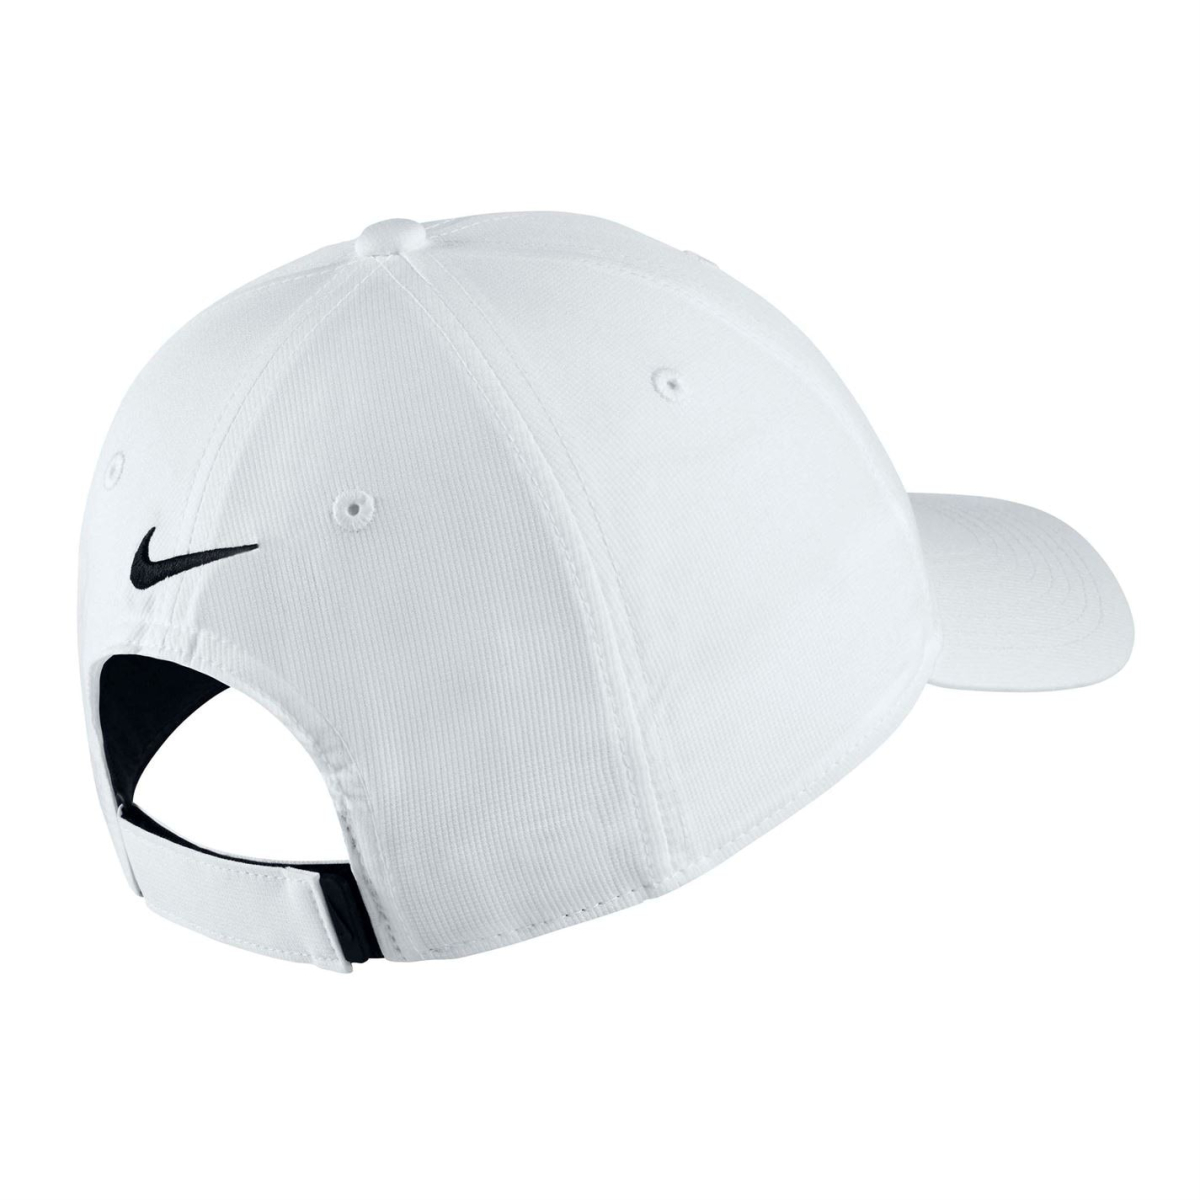 Nike Legacy 91 Tech Swoosh Kappe Baseball Caps Basecap Herren Golf 8027